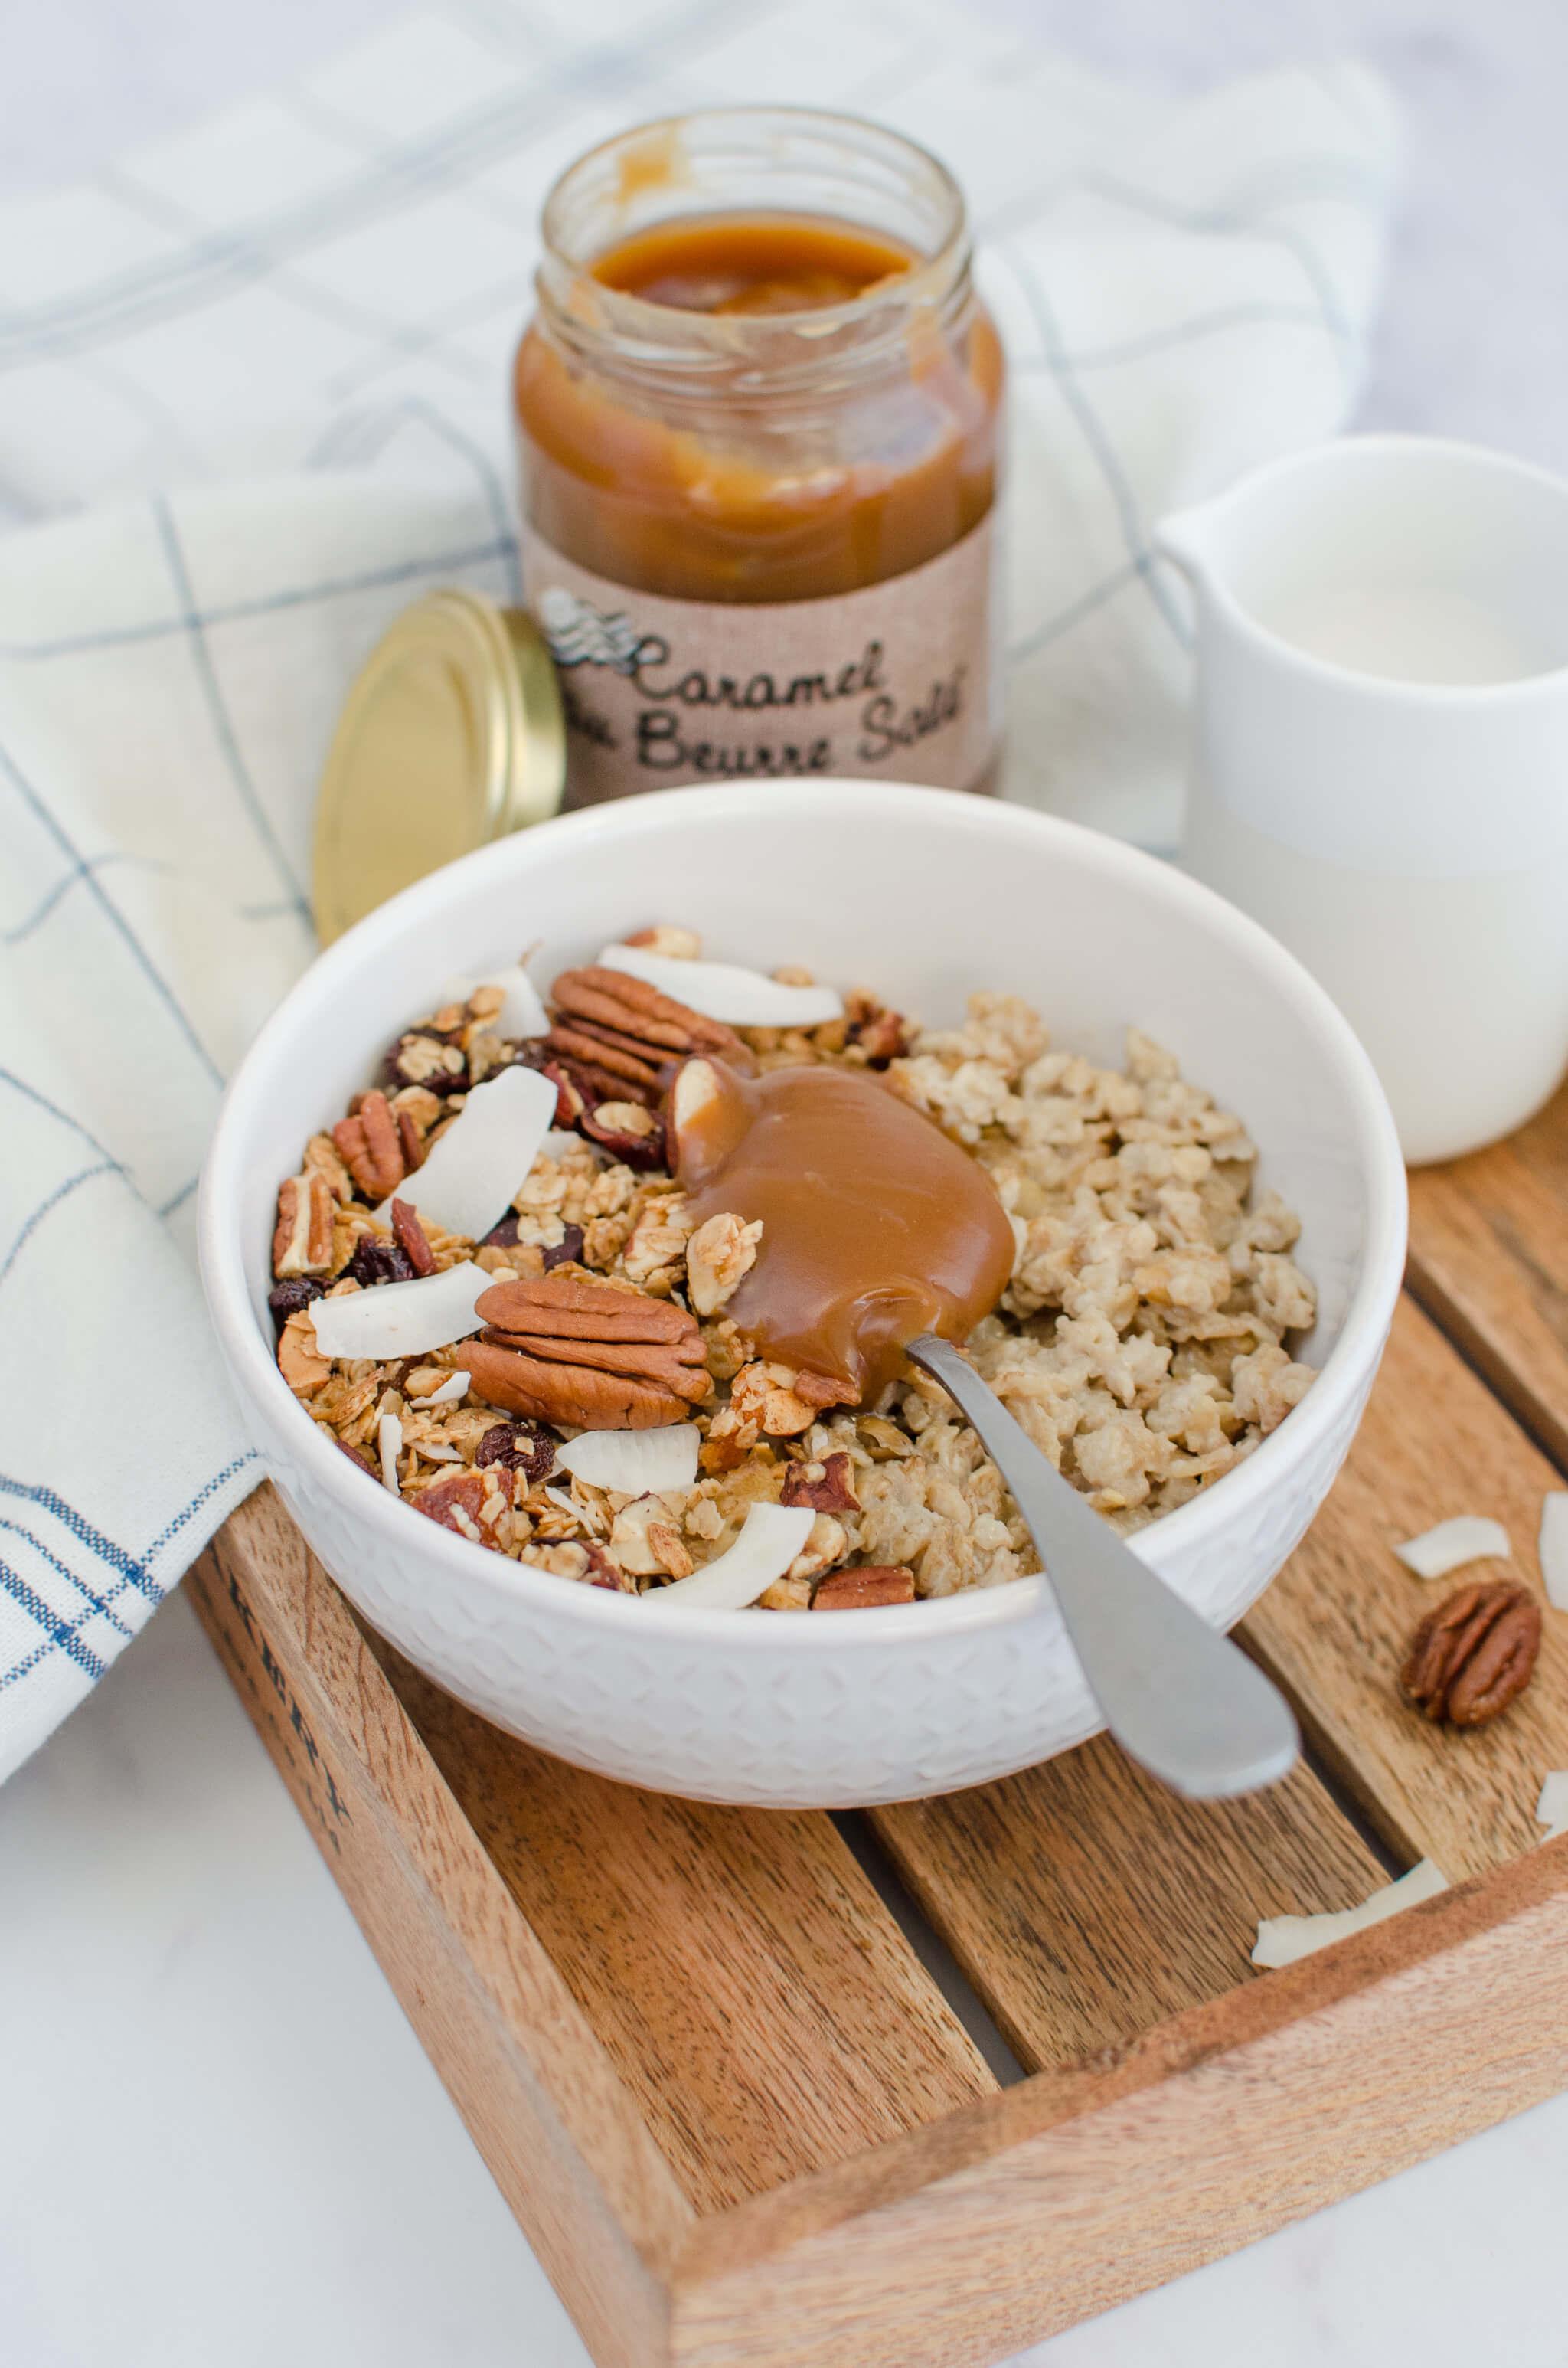 Porridge et granola au caramel au beurre salé